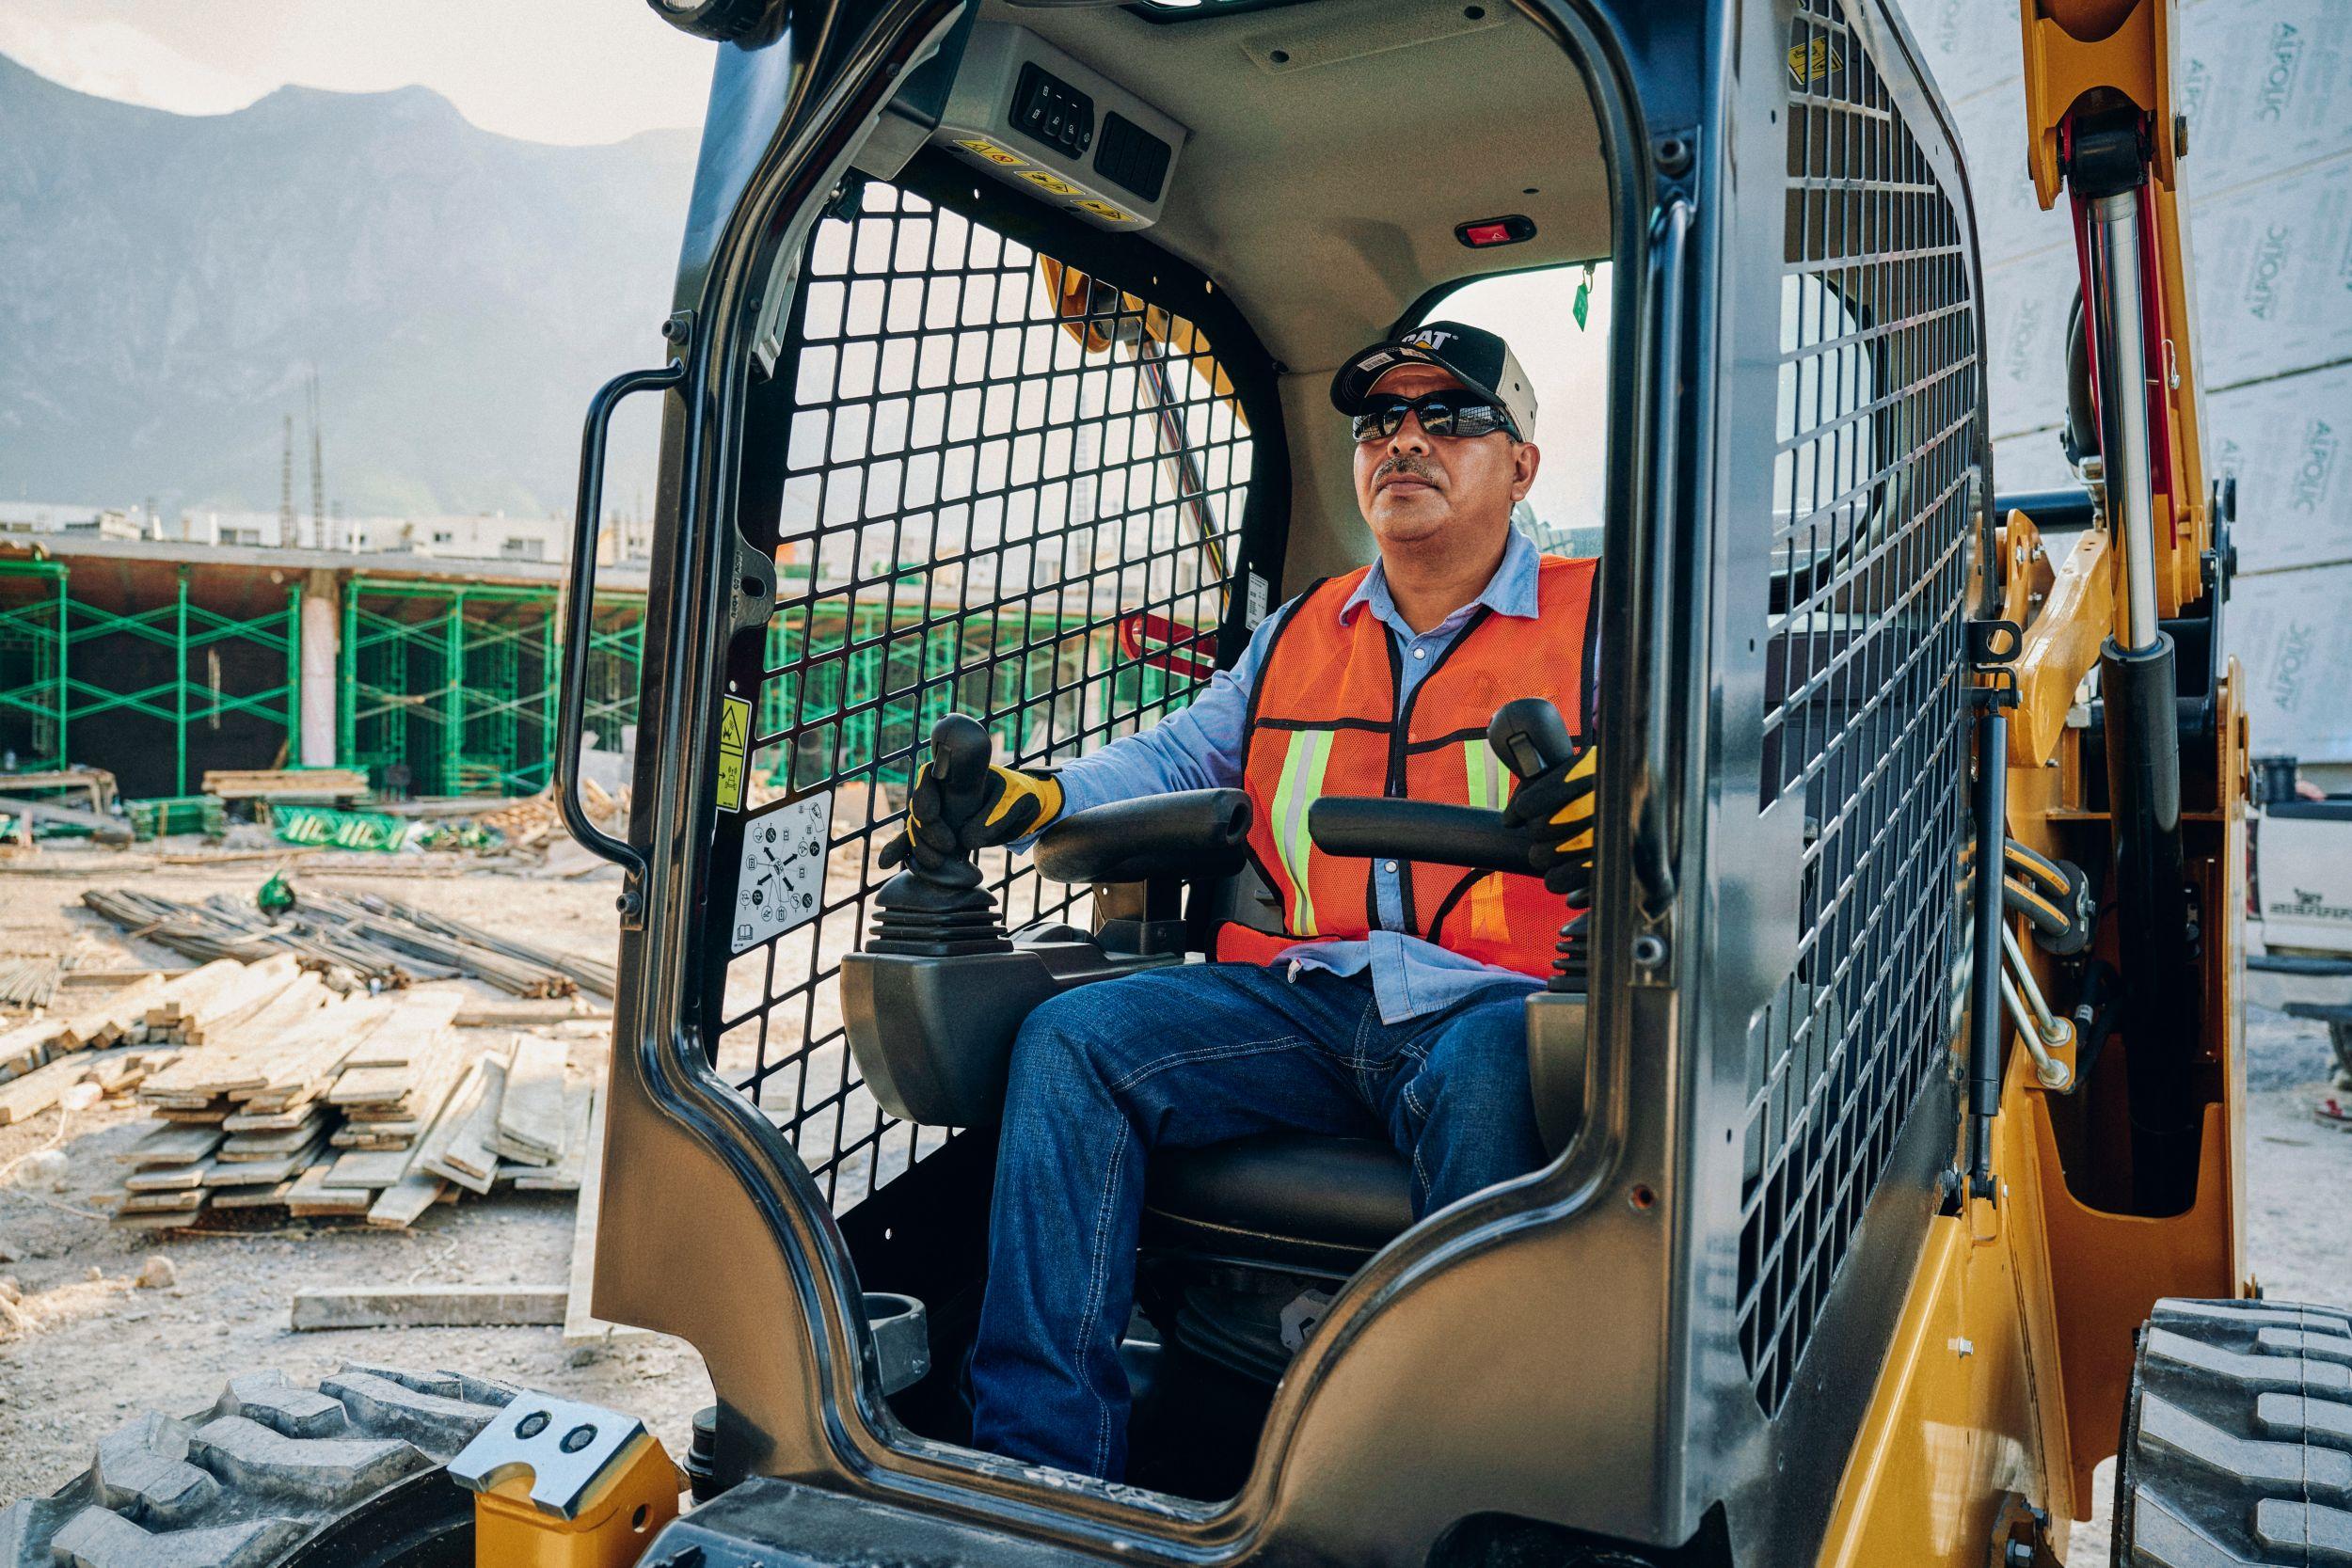 Capacitación para operadores de maquinaria de construcción.